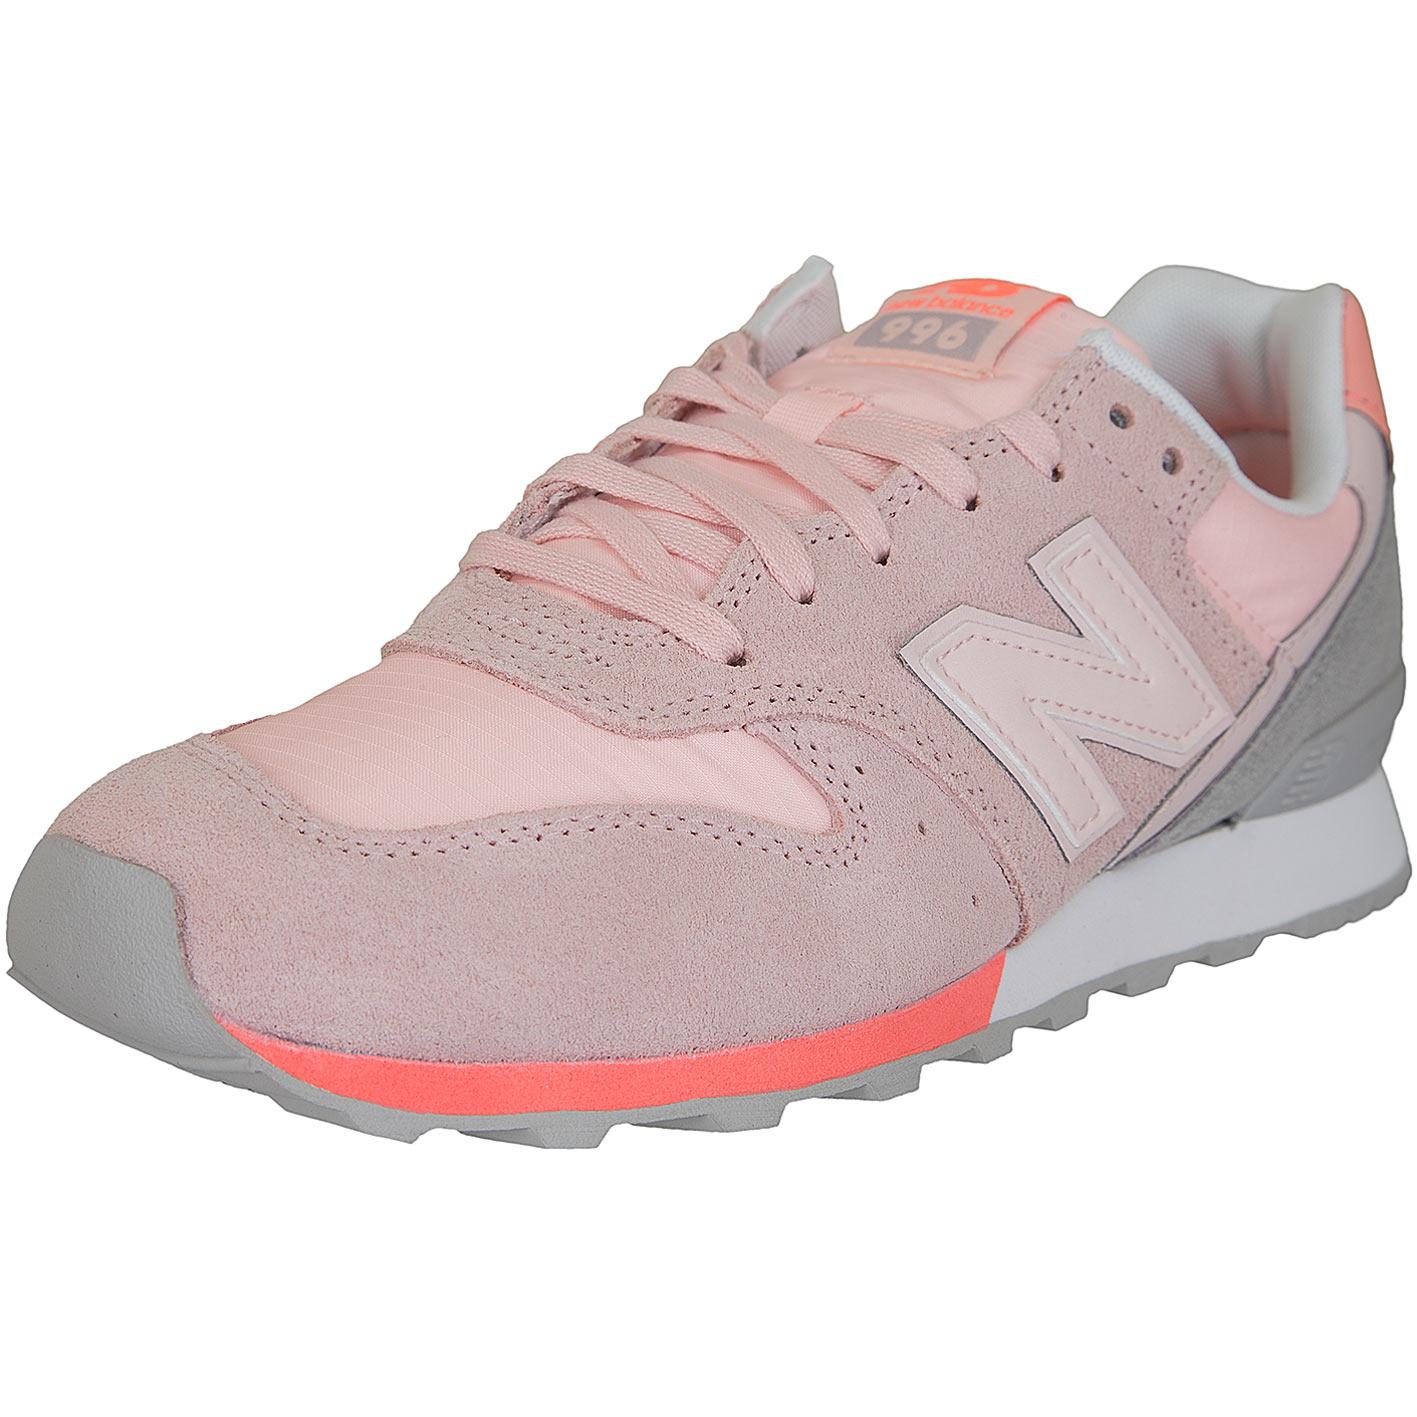 New Balance Damen Sneaker 996 Wildleder/Textil rosa